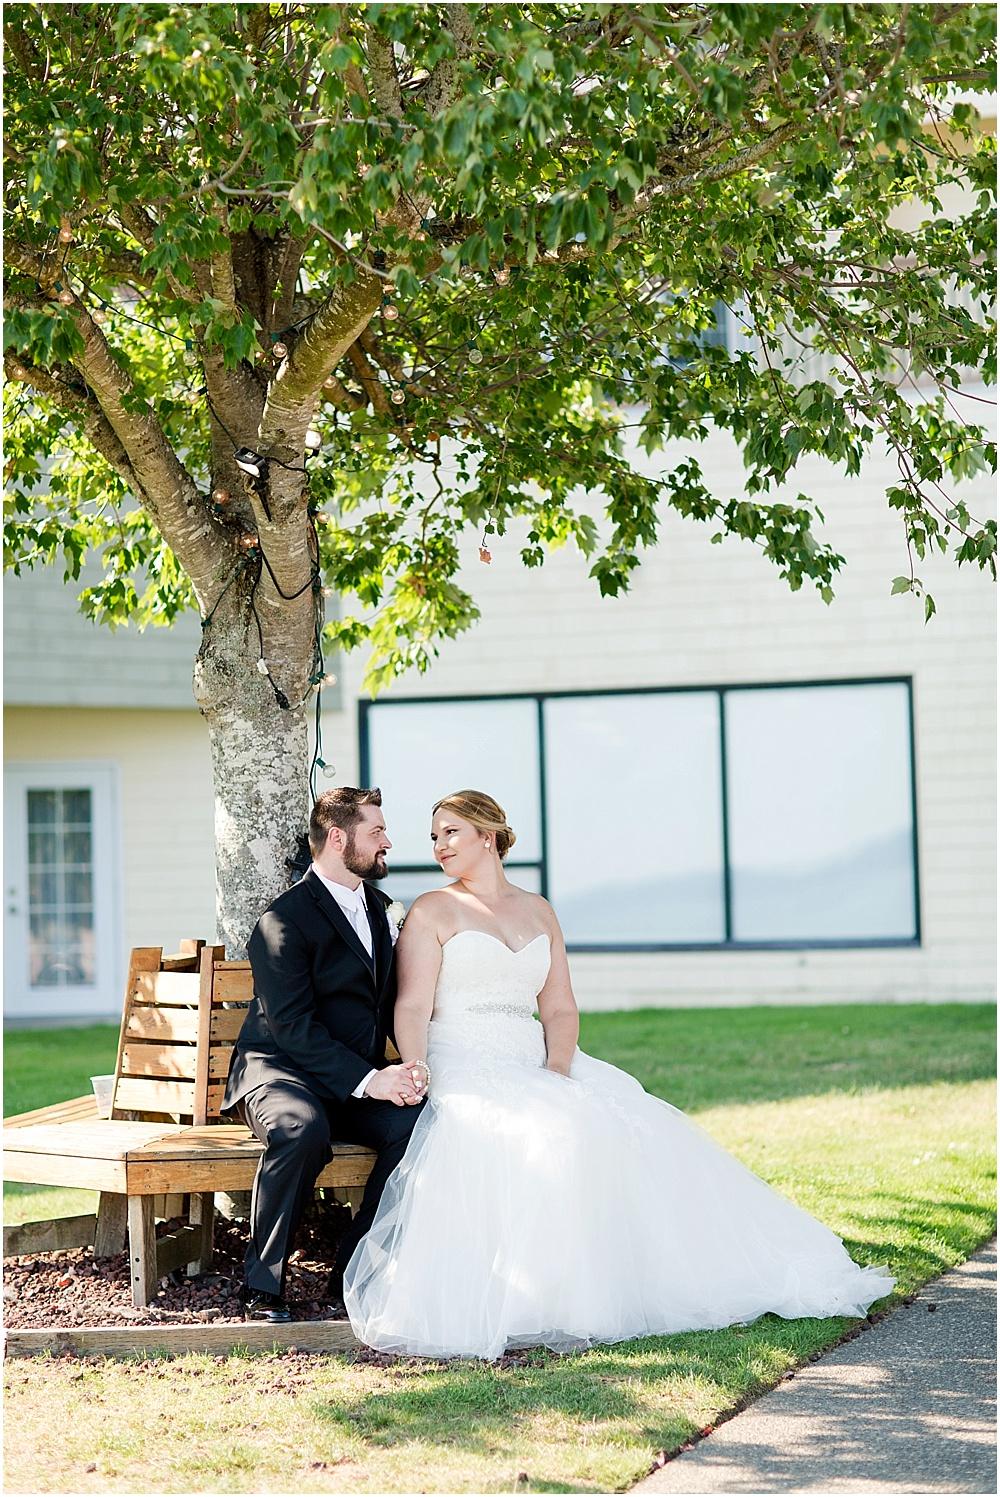 mitzner_silverdale_beach_hotel_wedding_silverdale_washington_pacific_northwest_wedding_photographer_0024